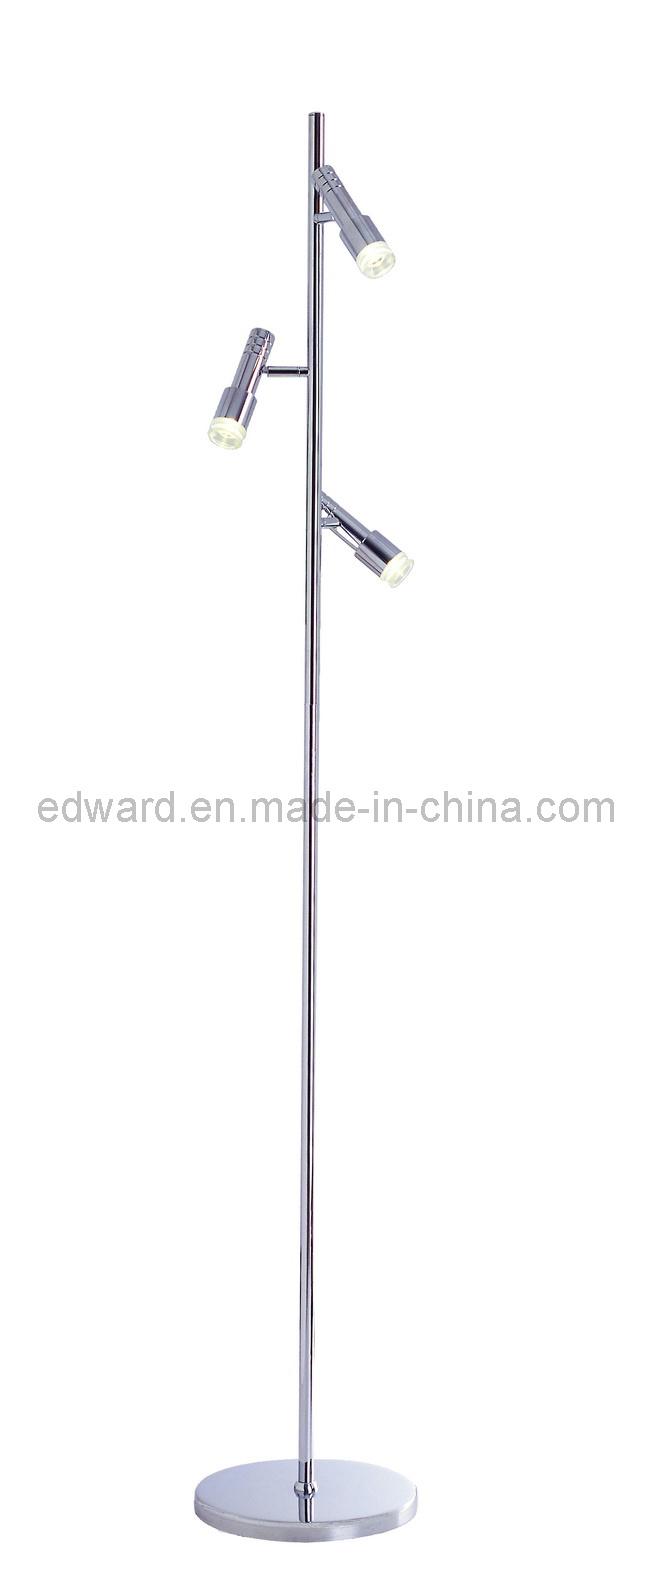 China high power led floor lamp z202003a01 china led for Led floor lamp china